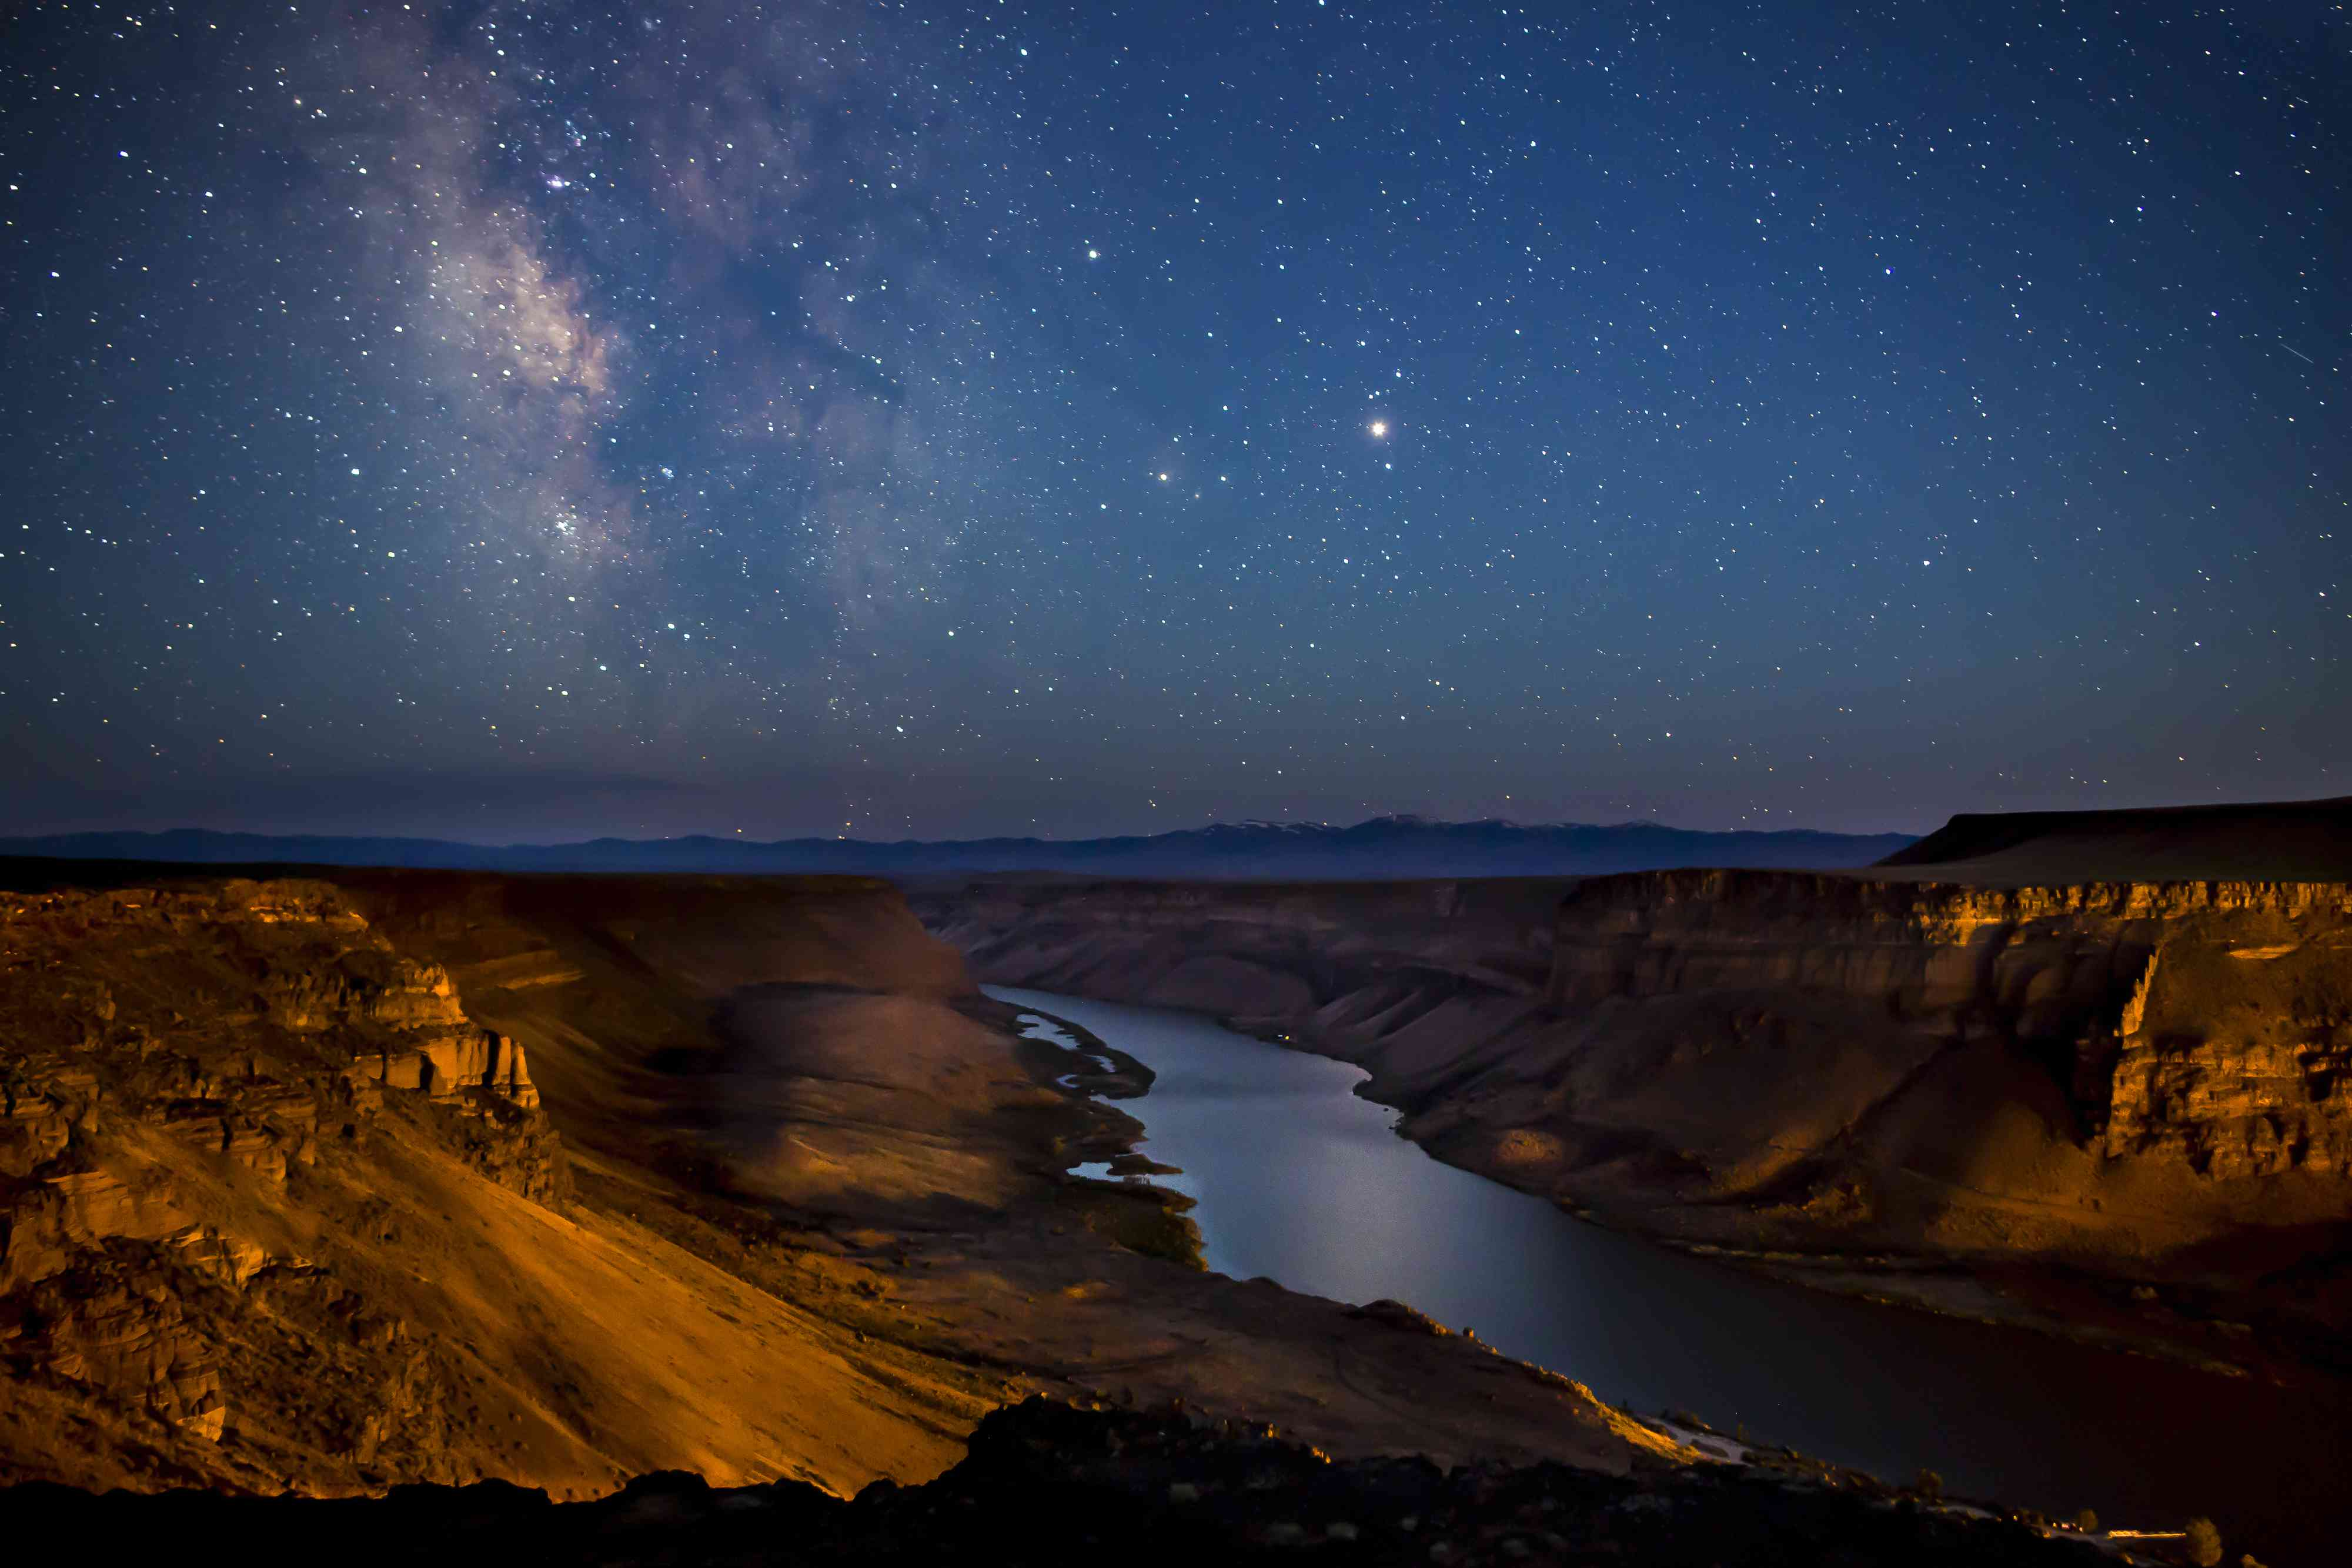 stars over Snake River, Idaho